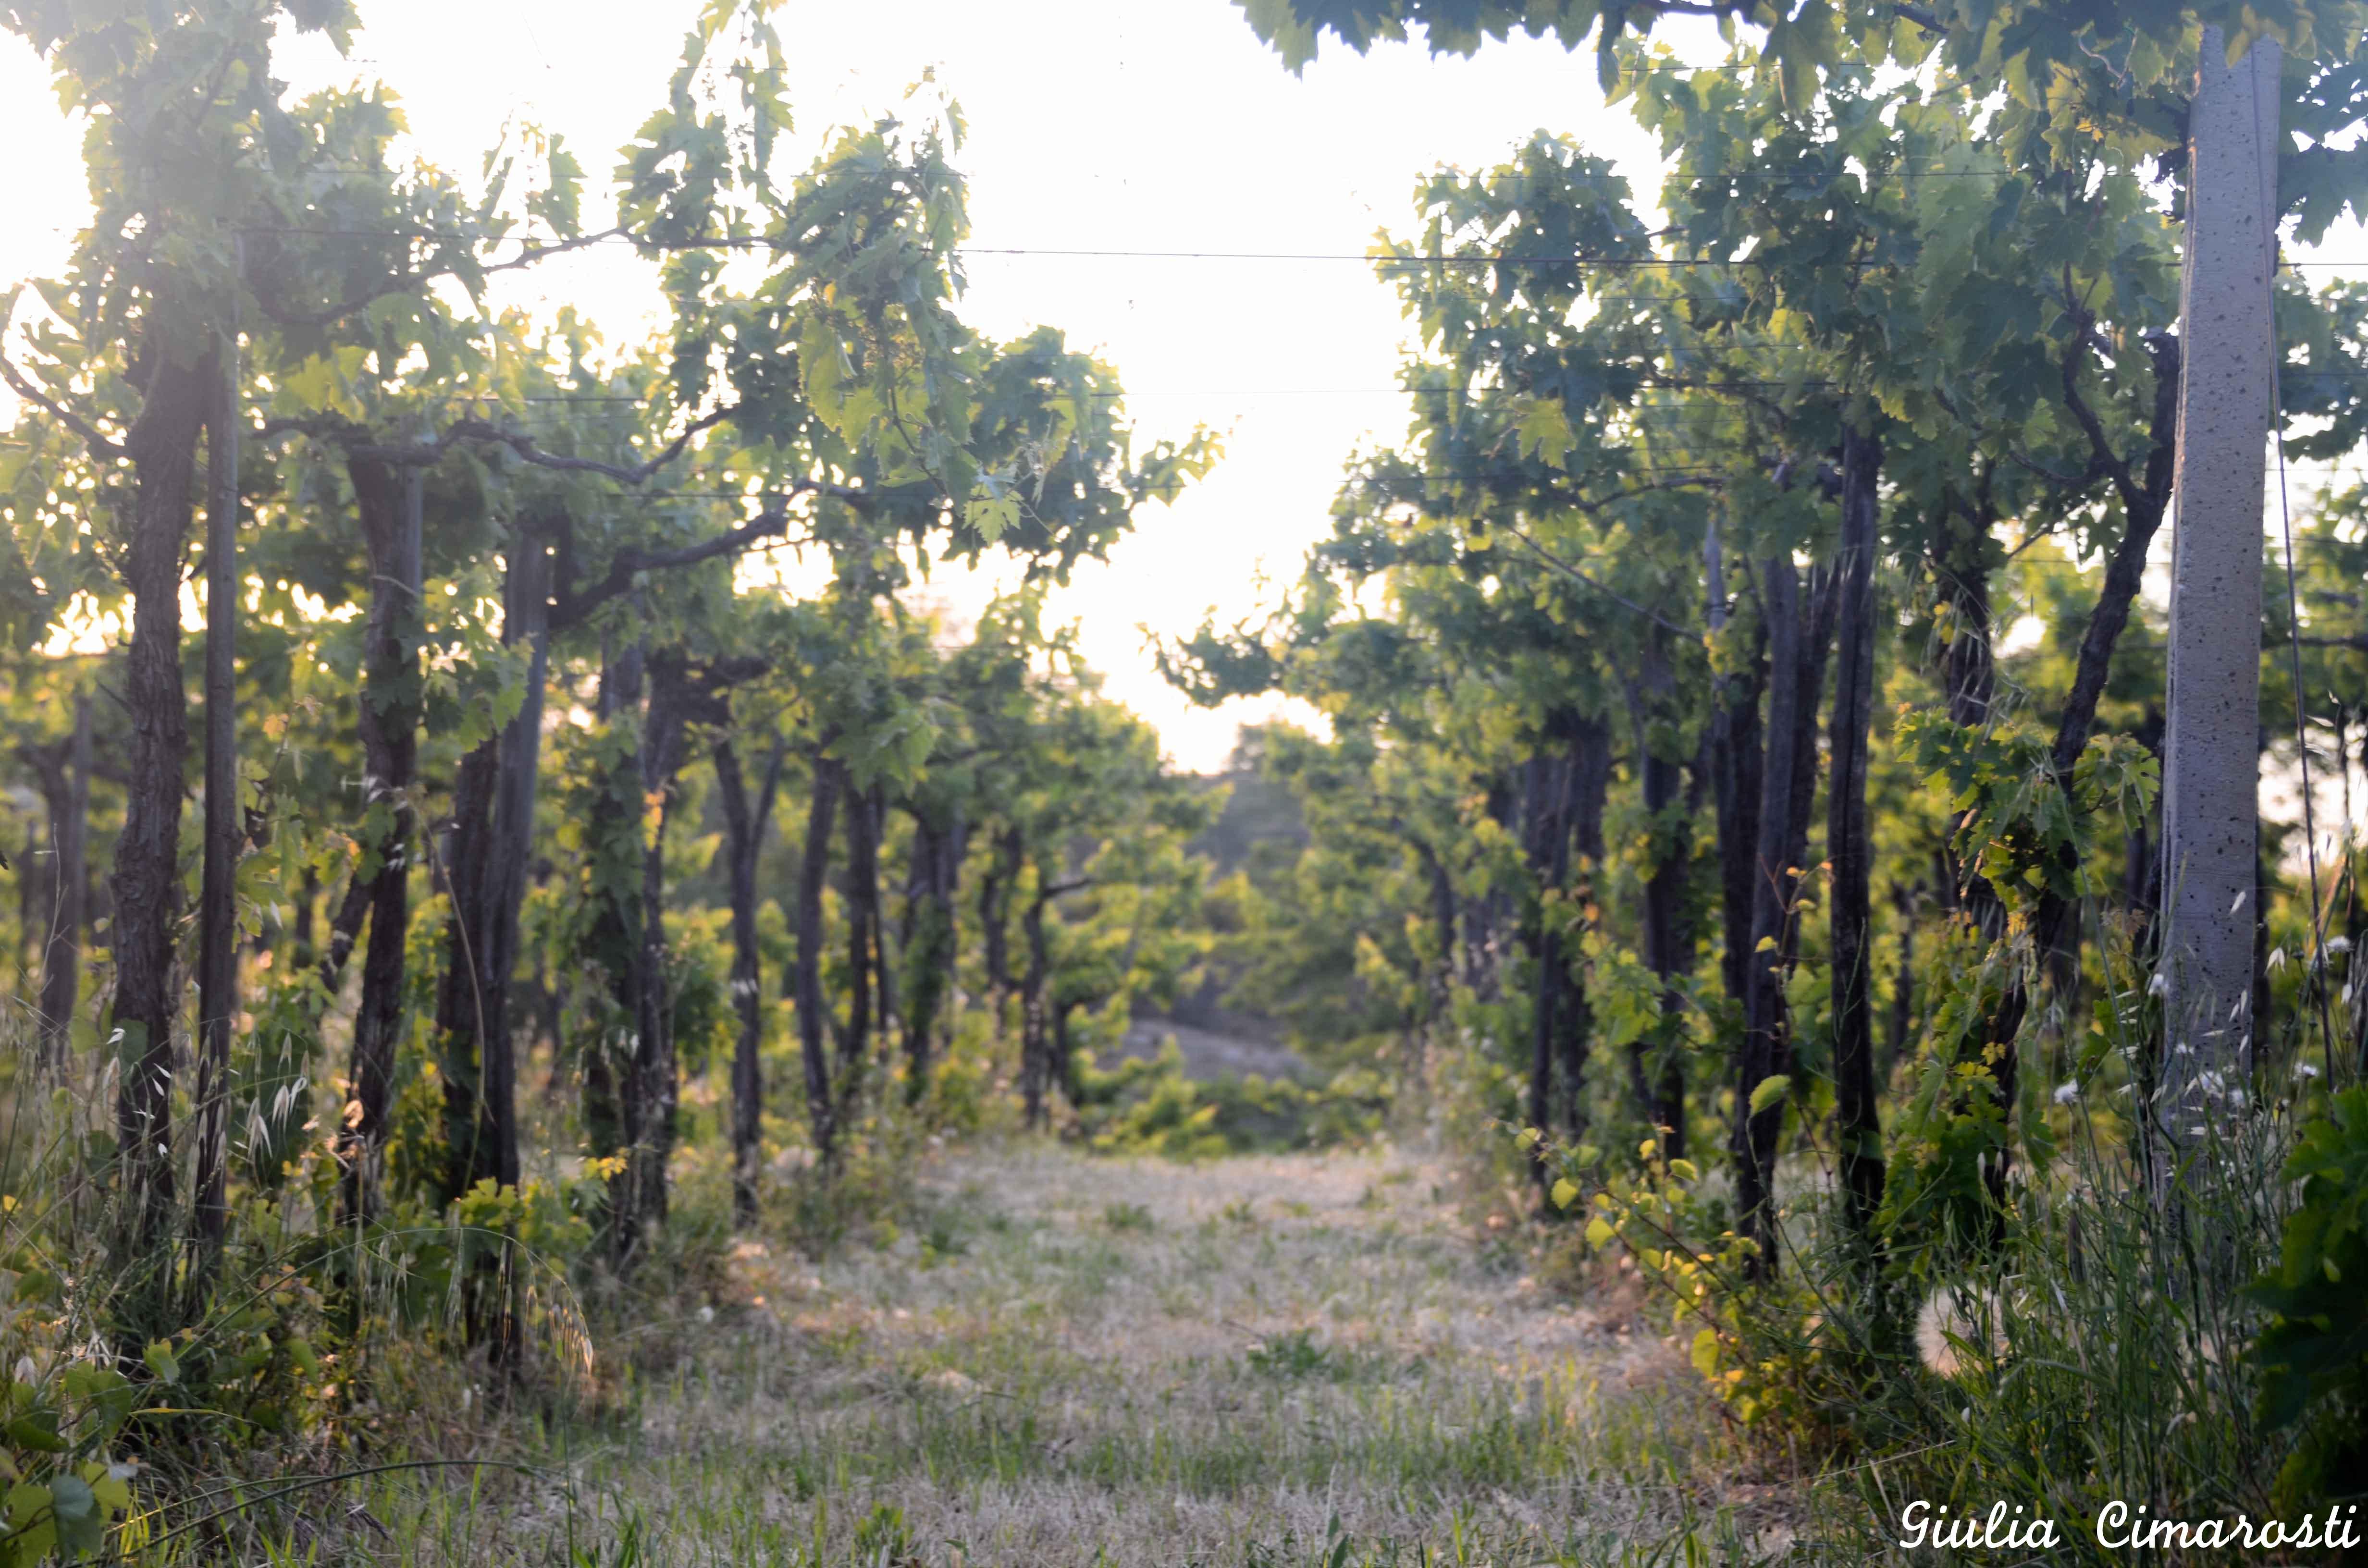 Abruzzo vineyards at sunset